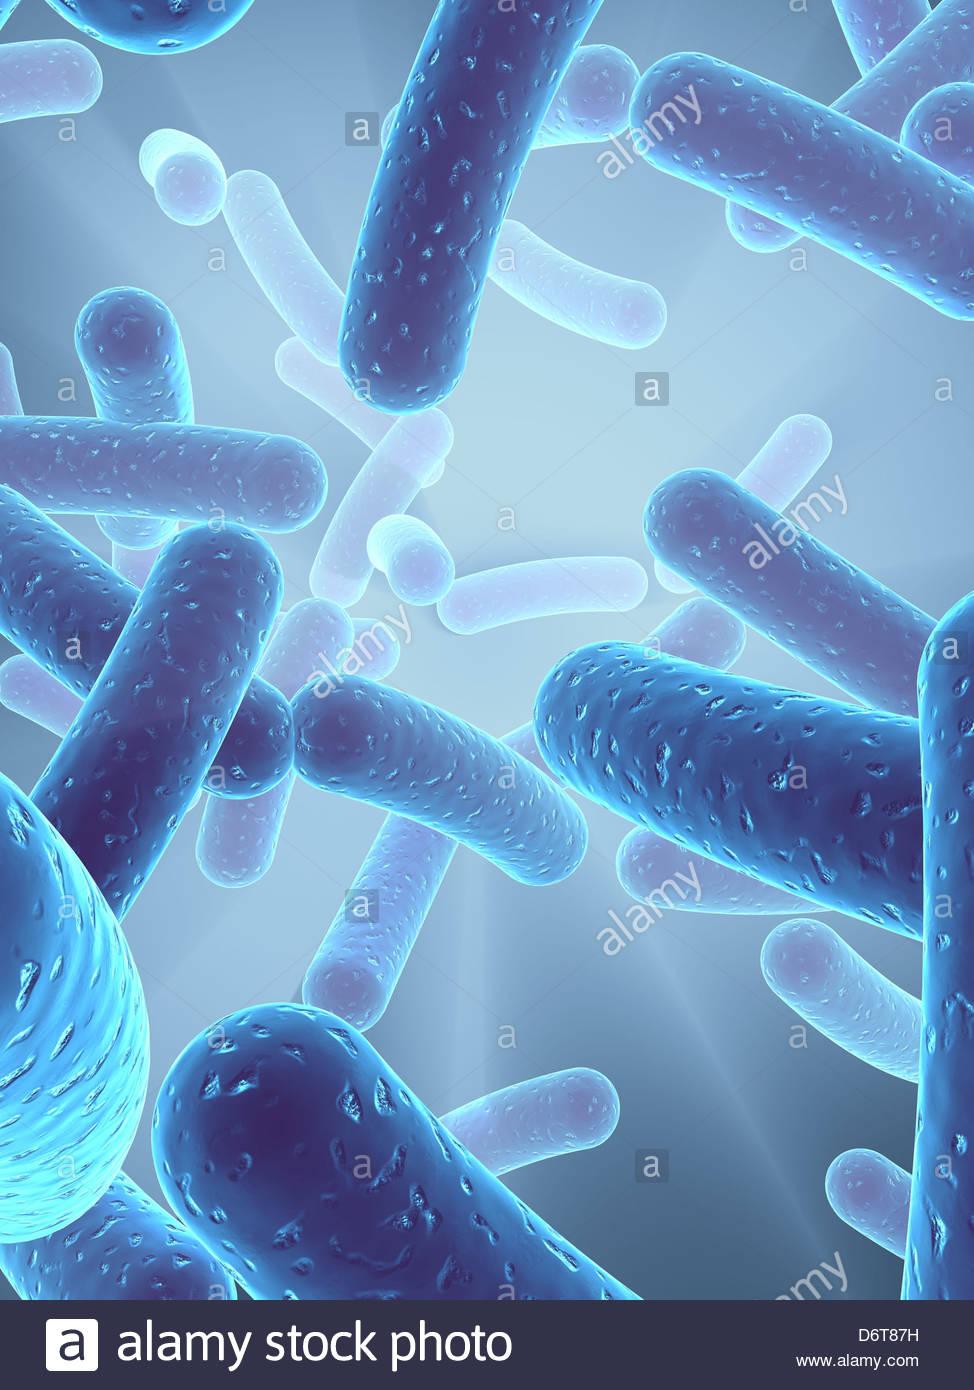 bacterium,medical illustrations - Stock Image